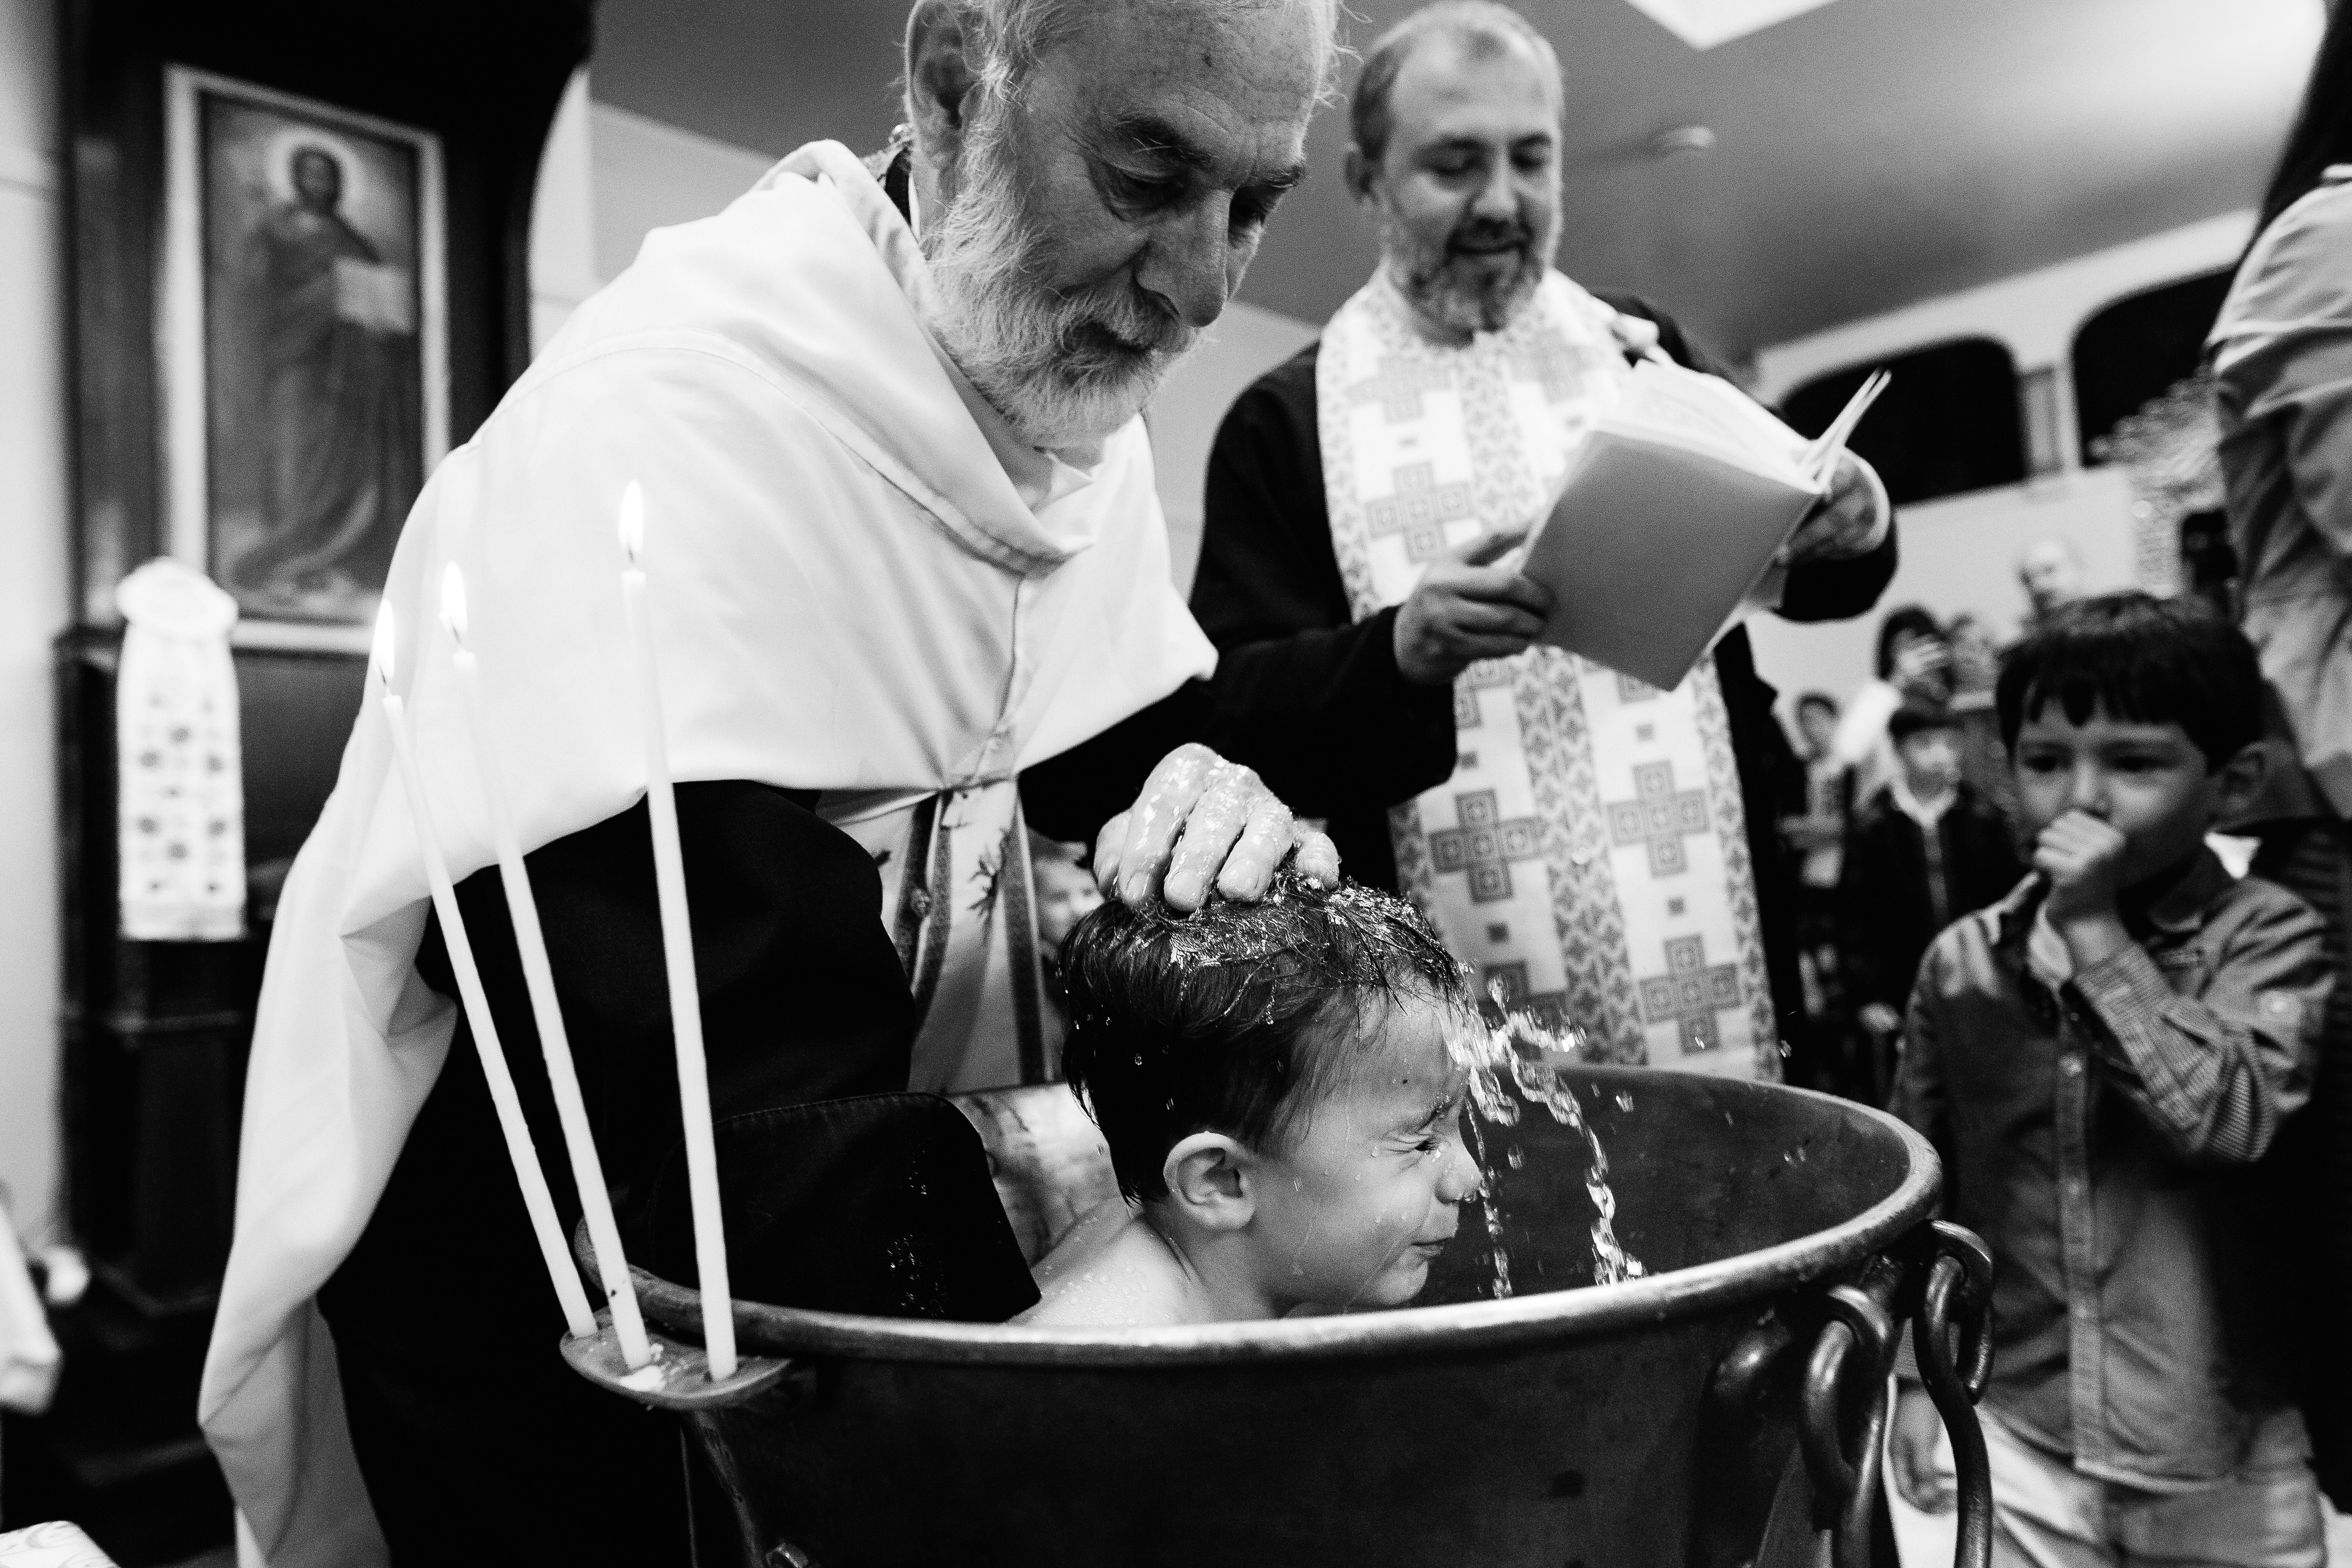 BAPTEME ORTHODOXE GREC LILLE